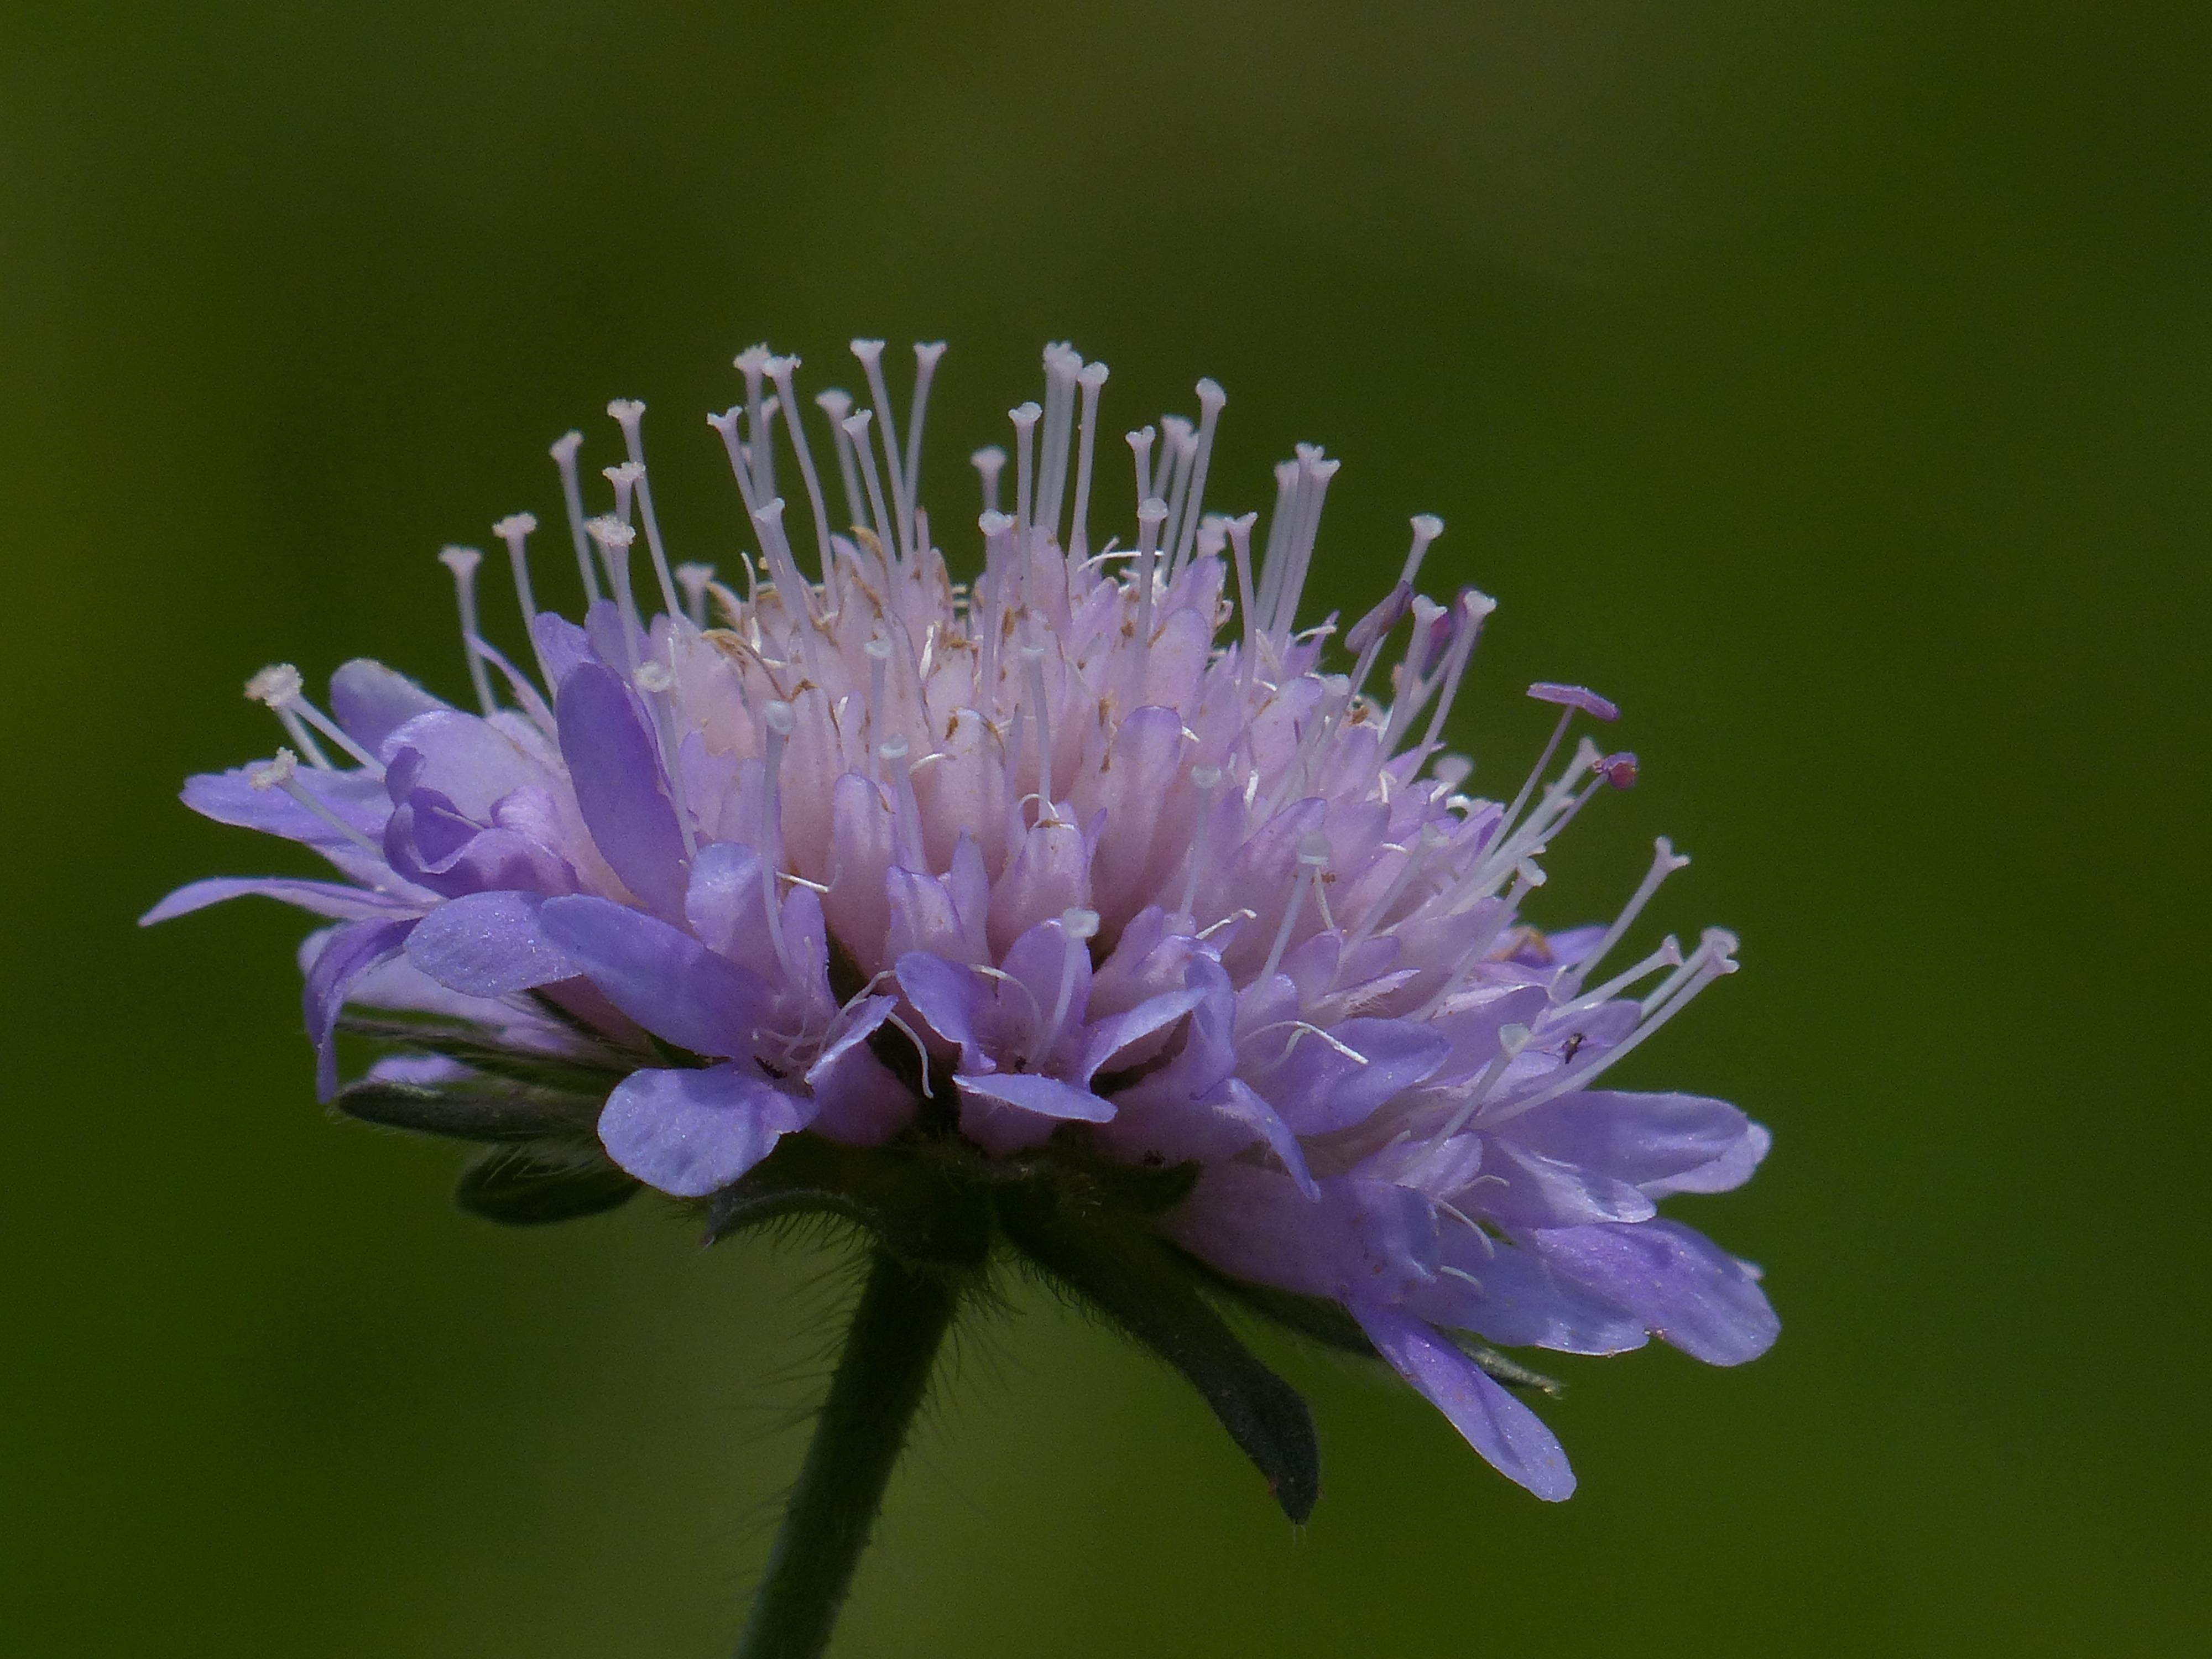 Free Images Nature Blossom Purple Petal Bloom Herb Produce